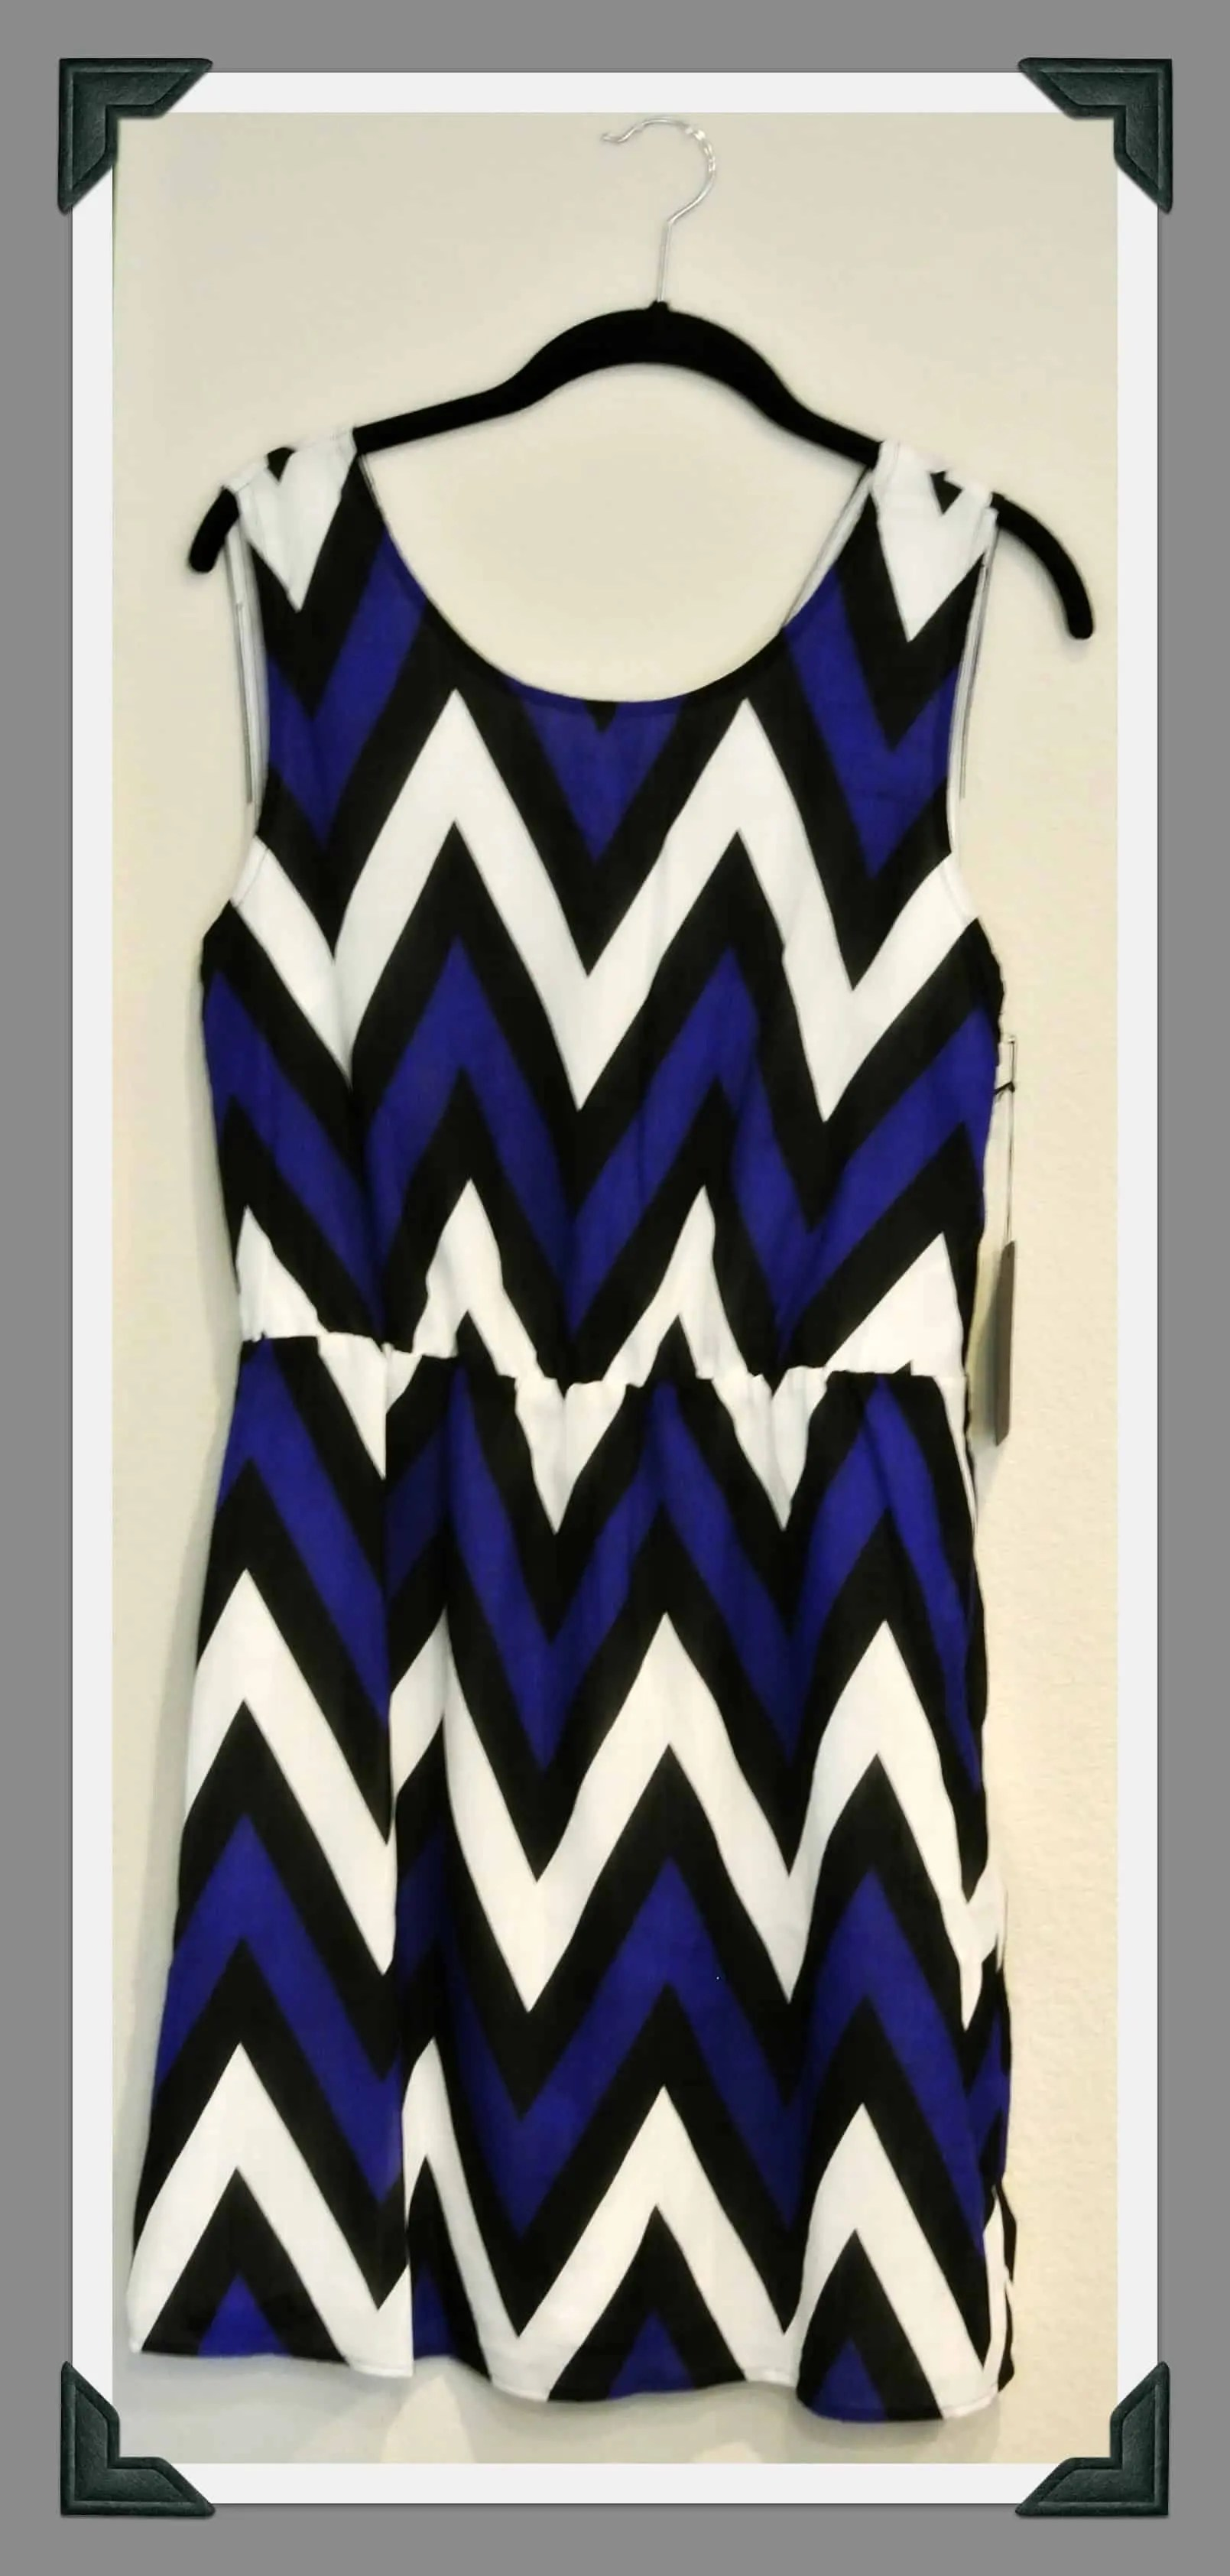 Stitch Fix Chevron Dress